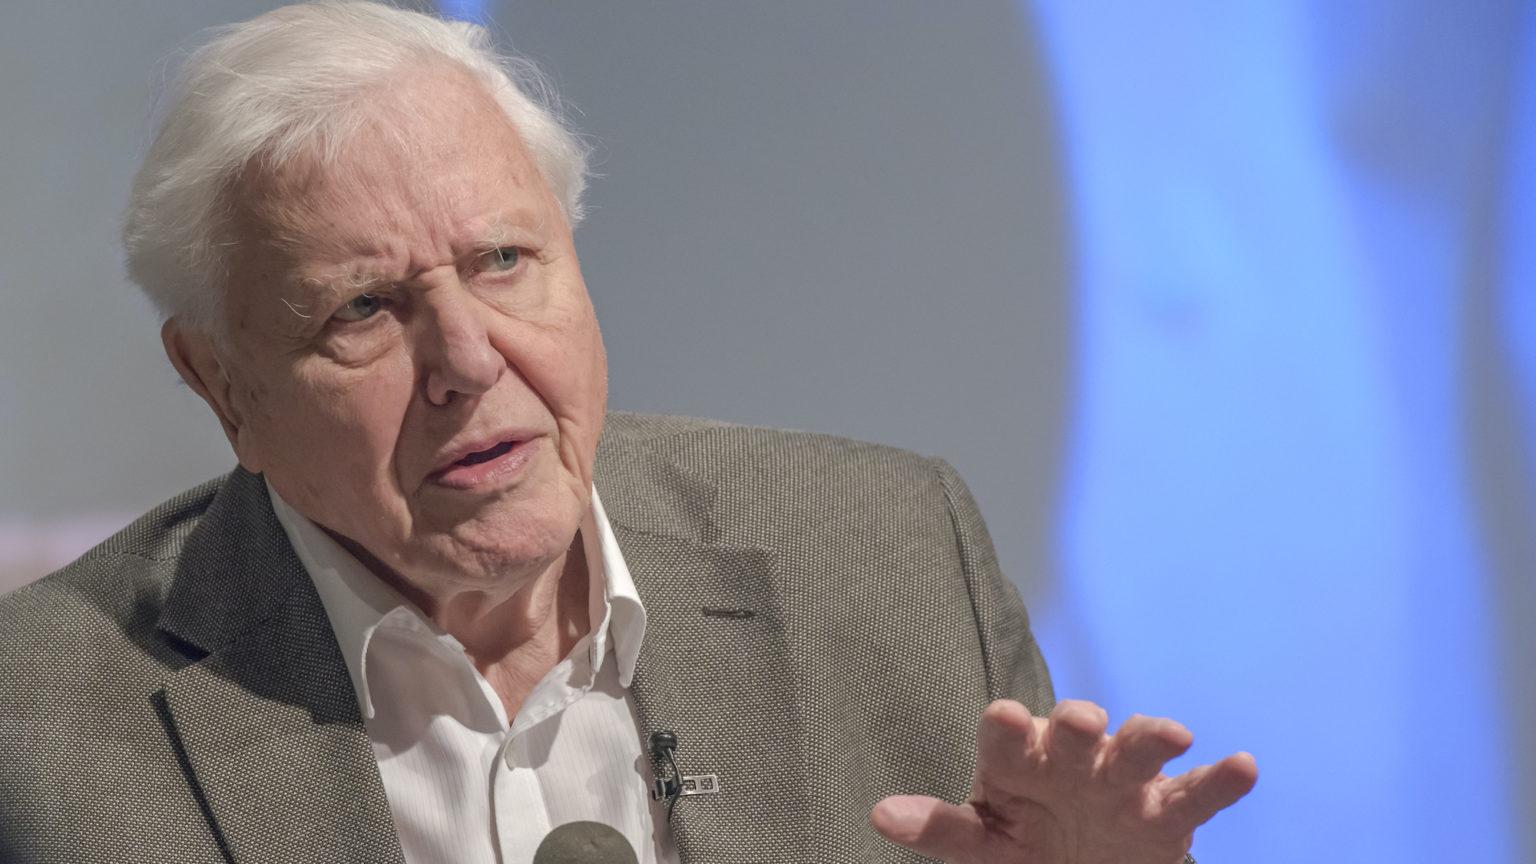 The anti-humanism of David Attenborough